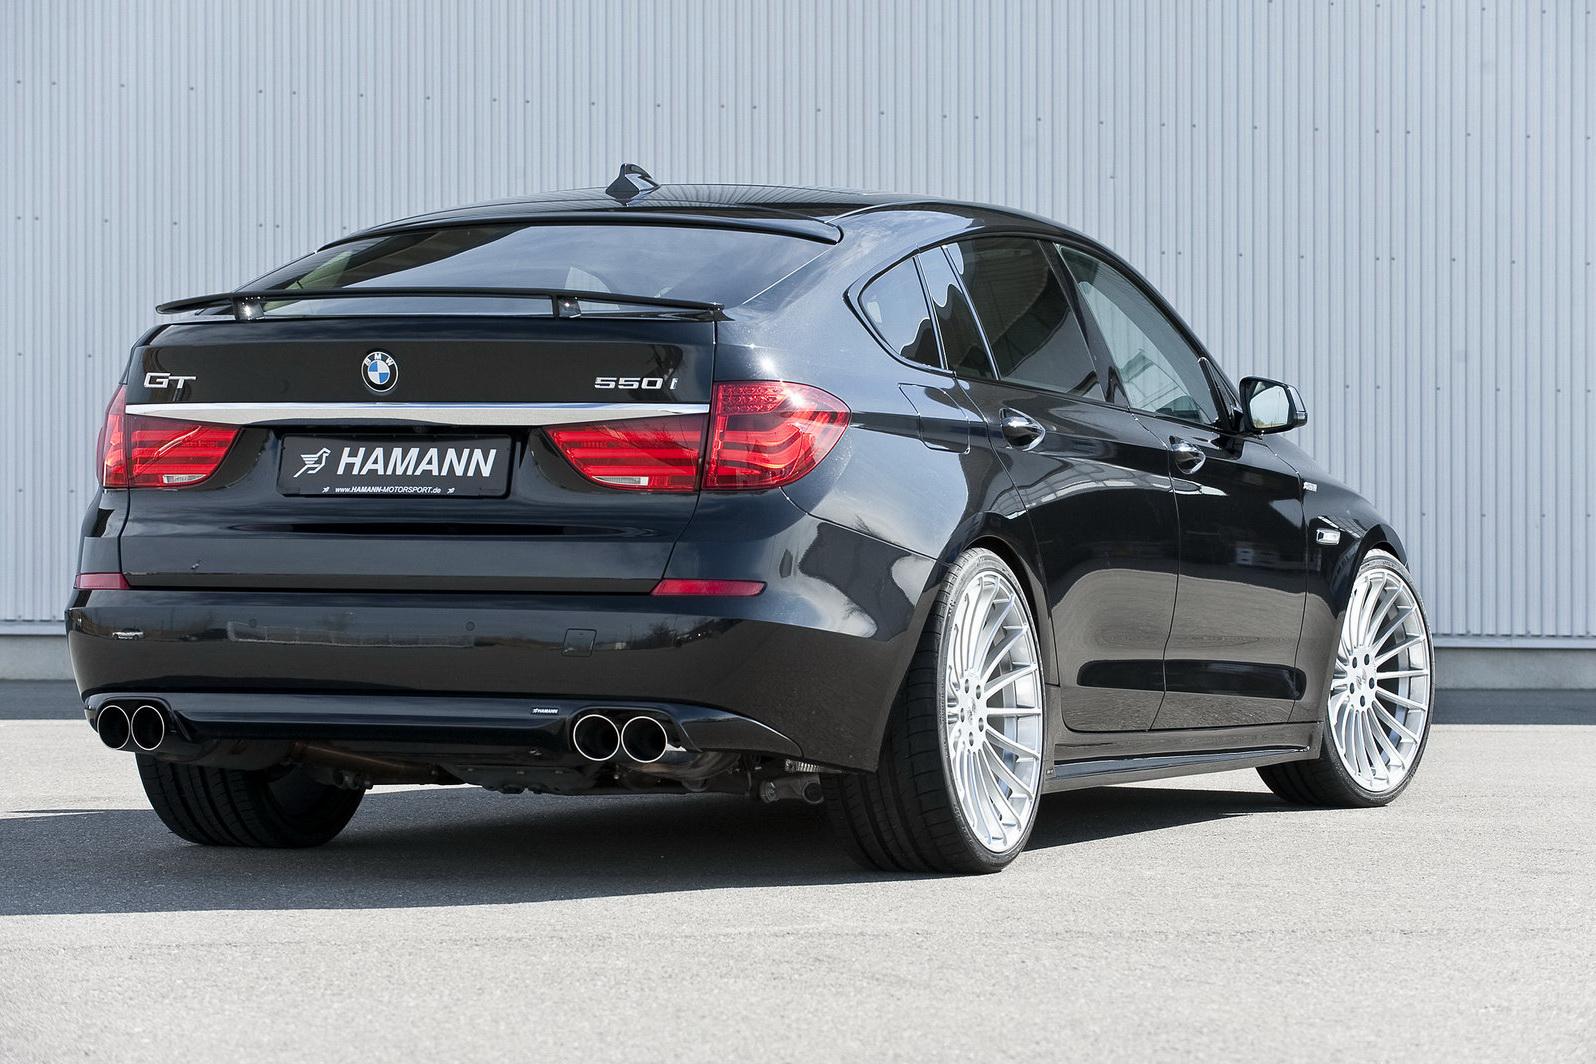 hamann motorsports reinterprets the bmw 530d gt carscoops. Black Bedroom Furniture Sets. Home Design Ideas